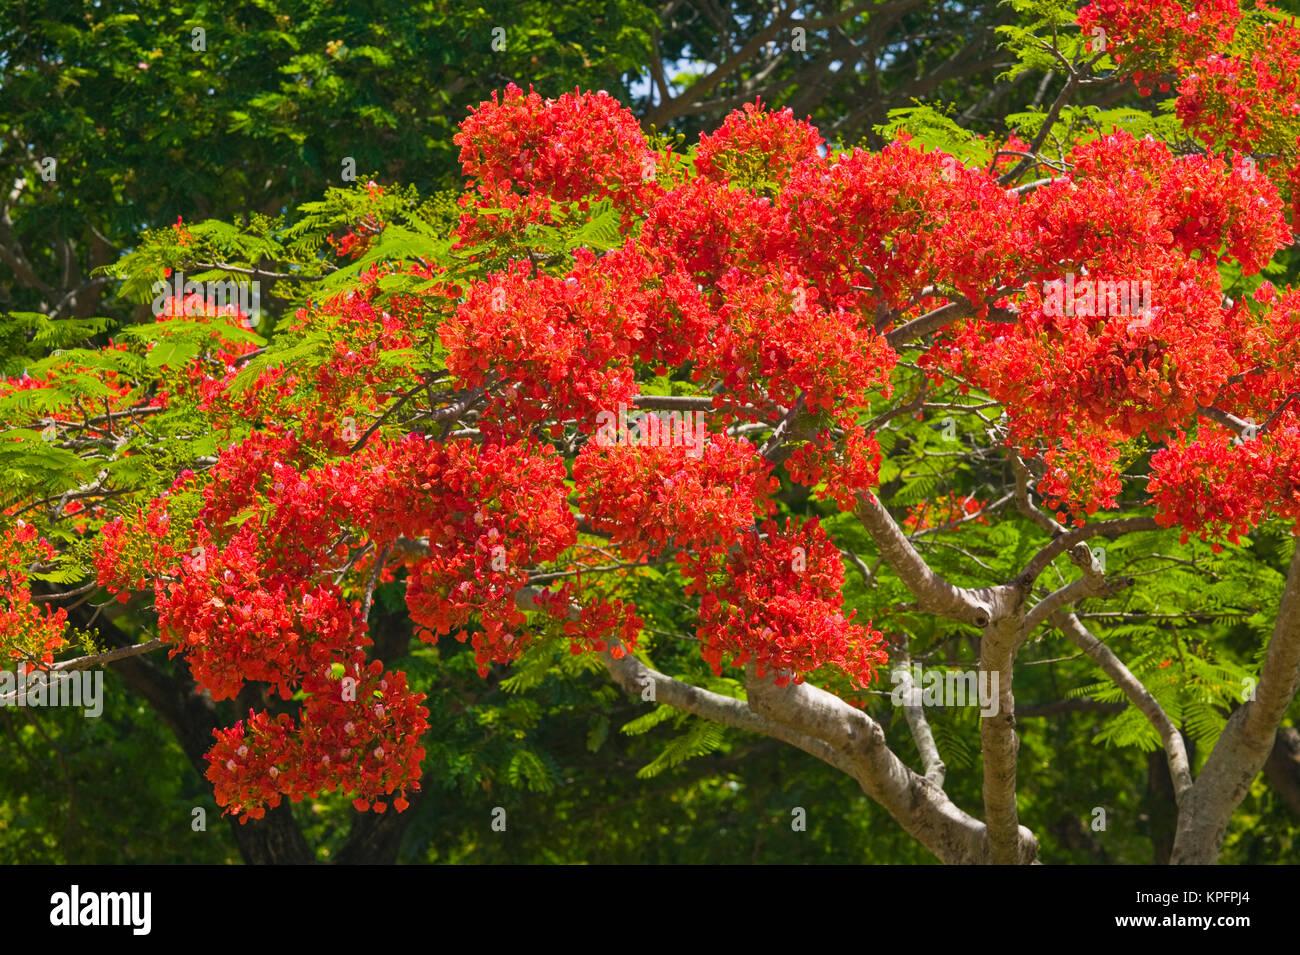 Australia, Queensland, North Coast, Port Douglas. Flamboyant Trees / Springtime. - Stock Image